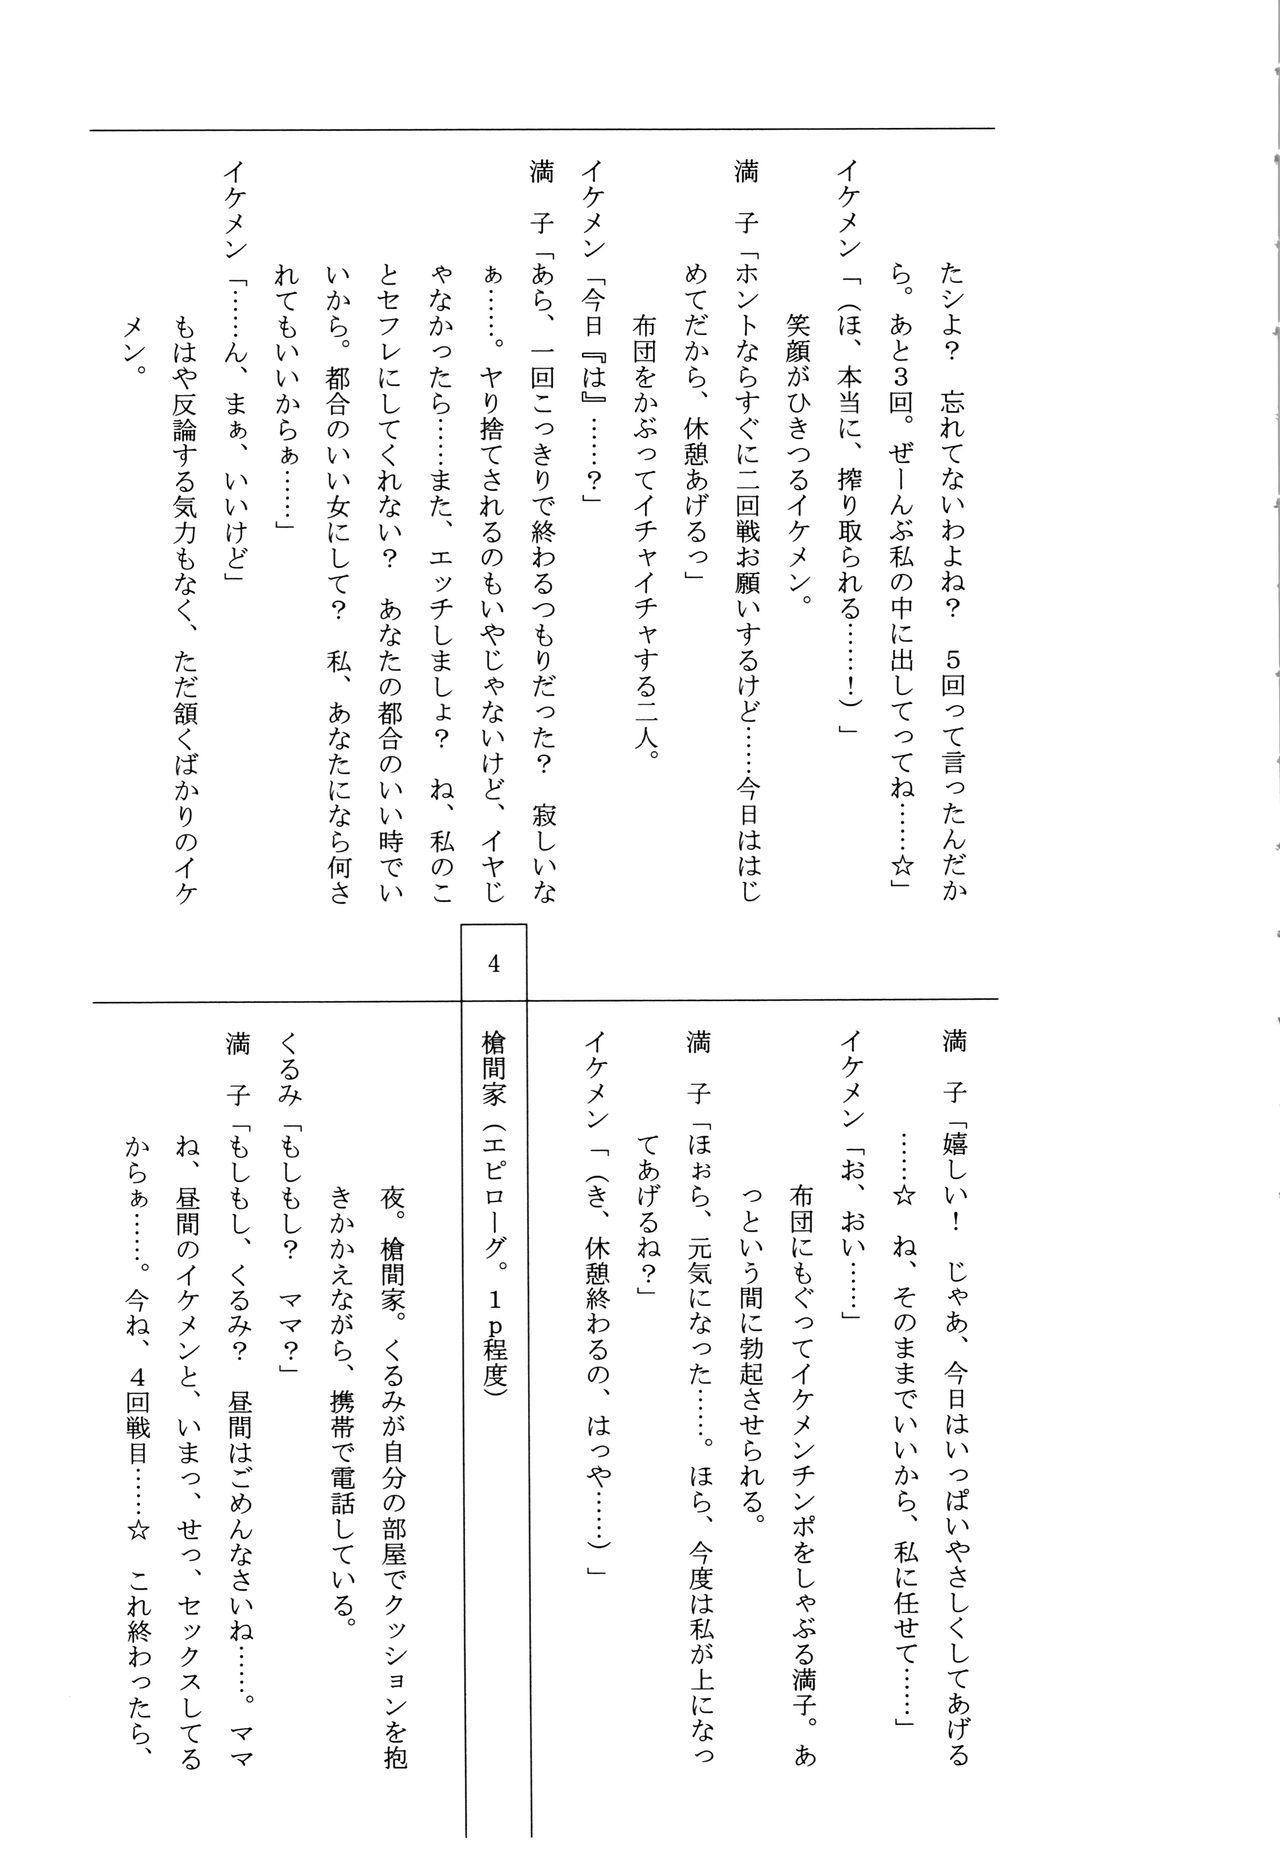 Teisou Kannen ZERO Shinsouban 1 194